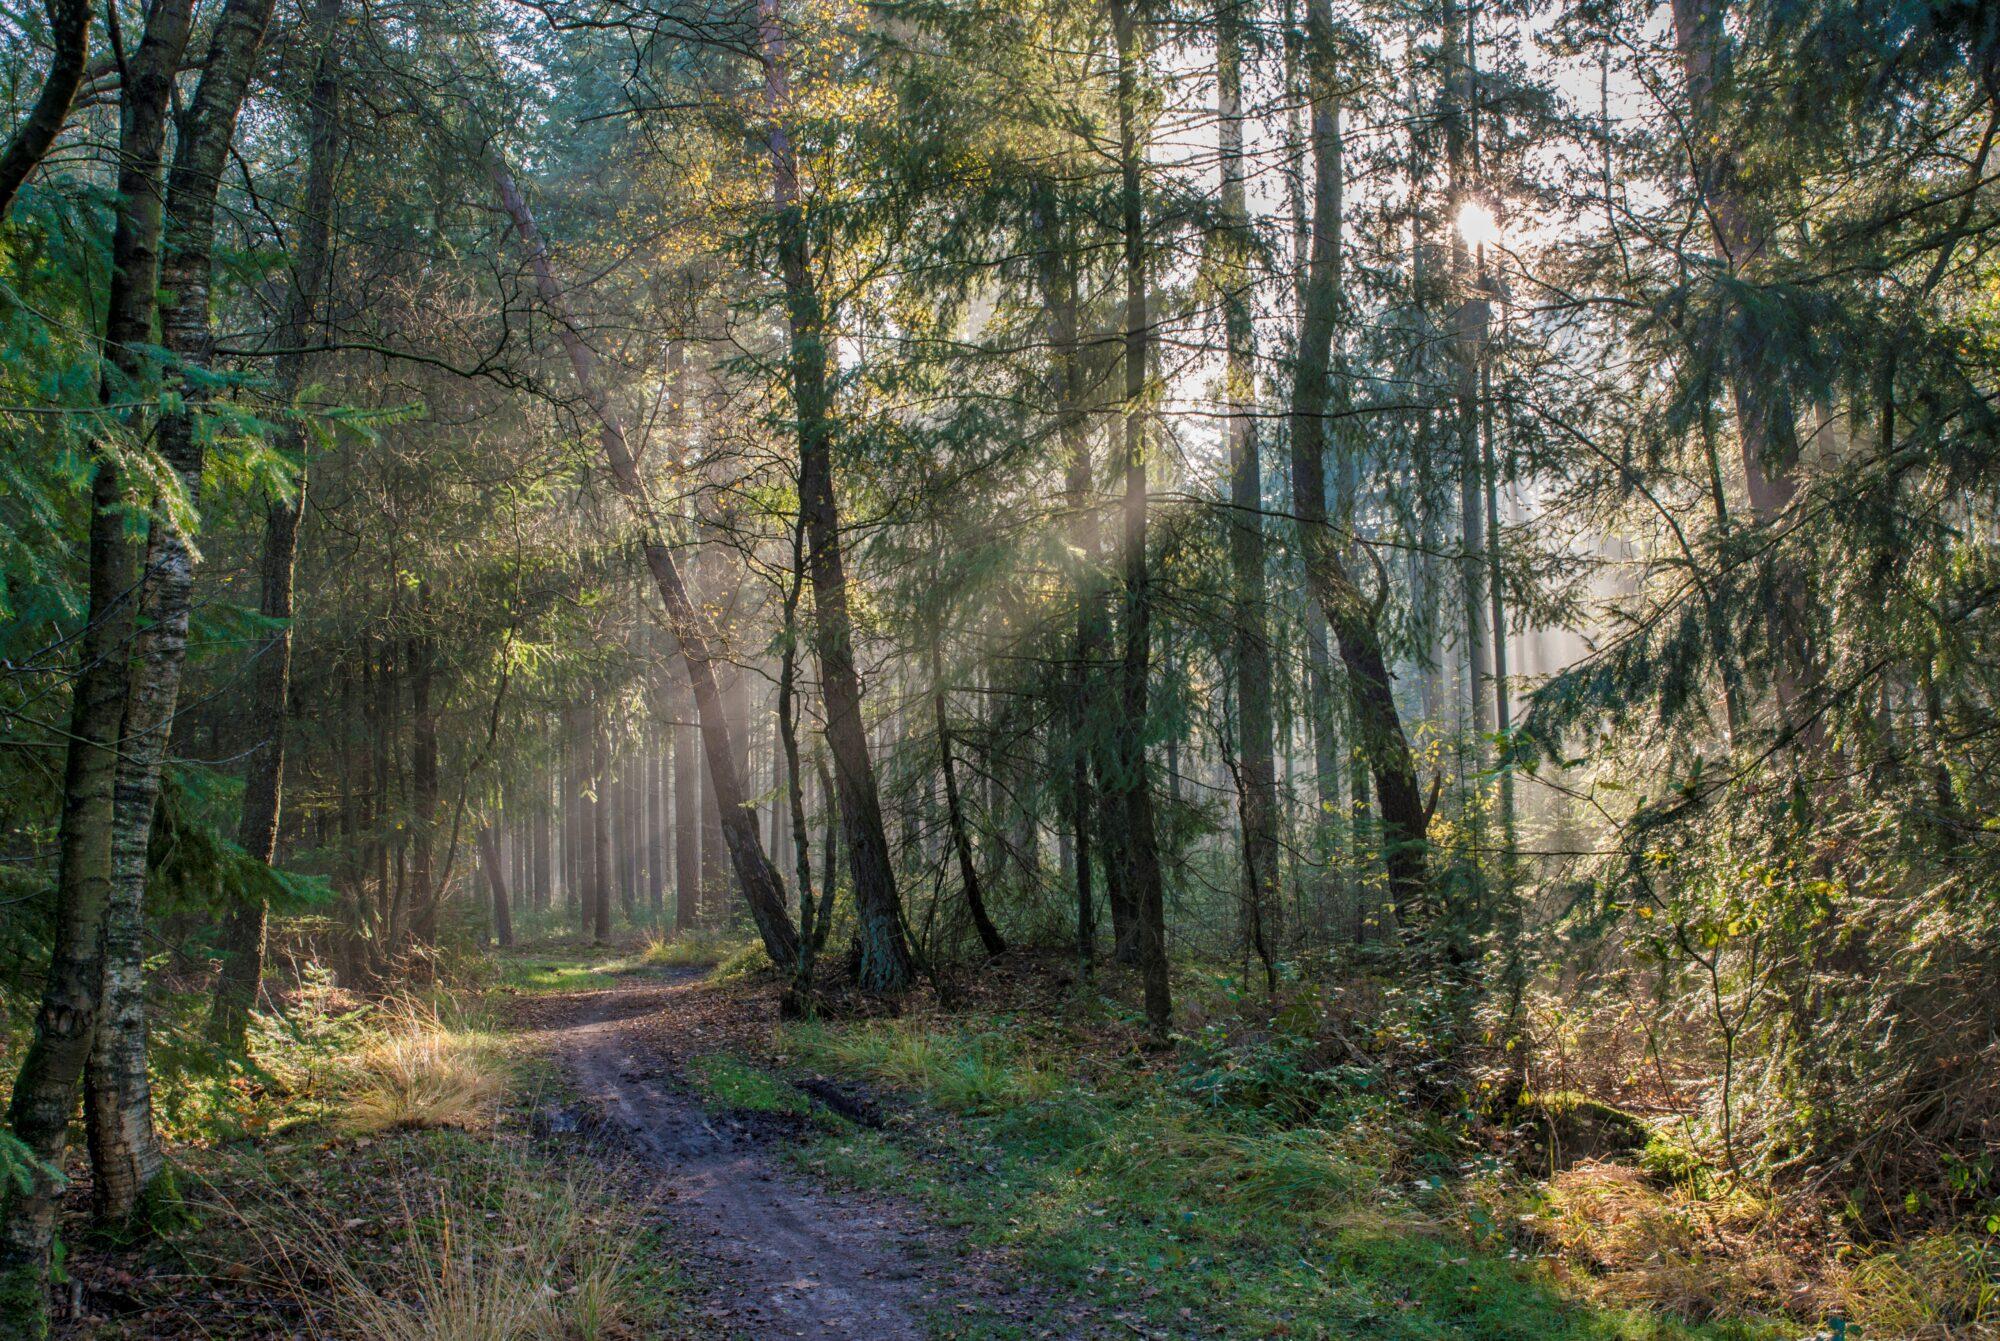 Asfalt weg uit natuurgebied Caitwickerzand